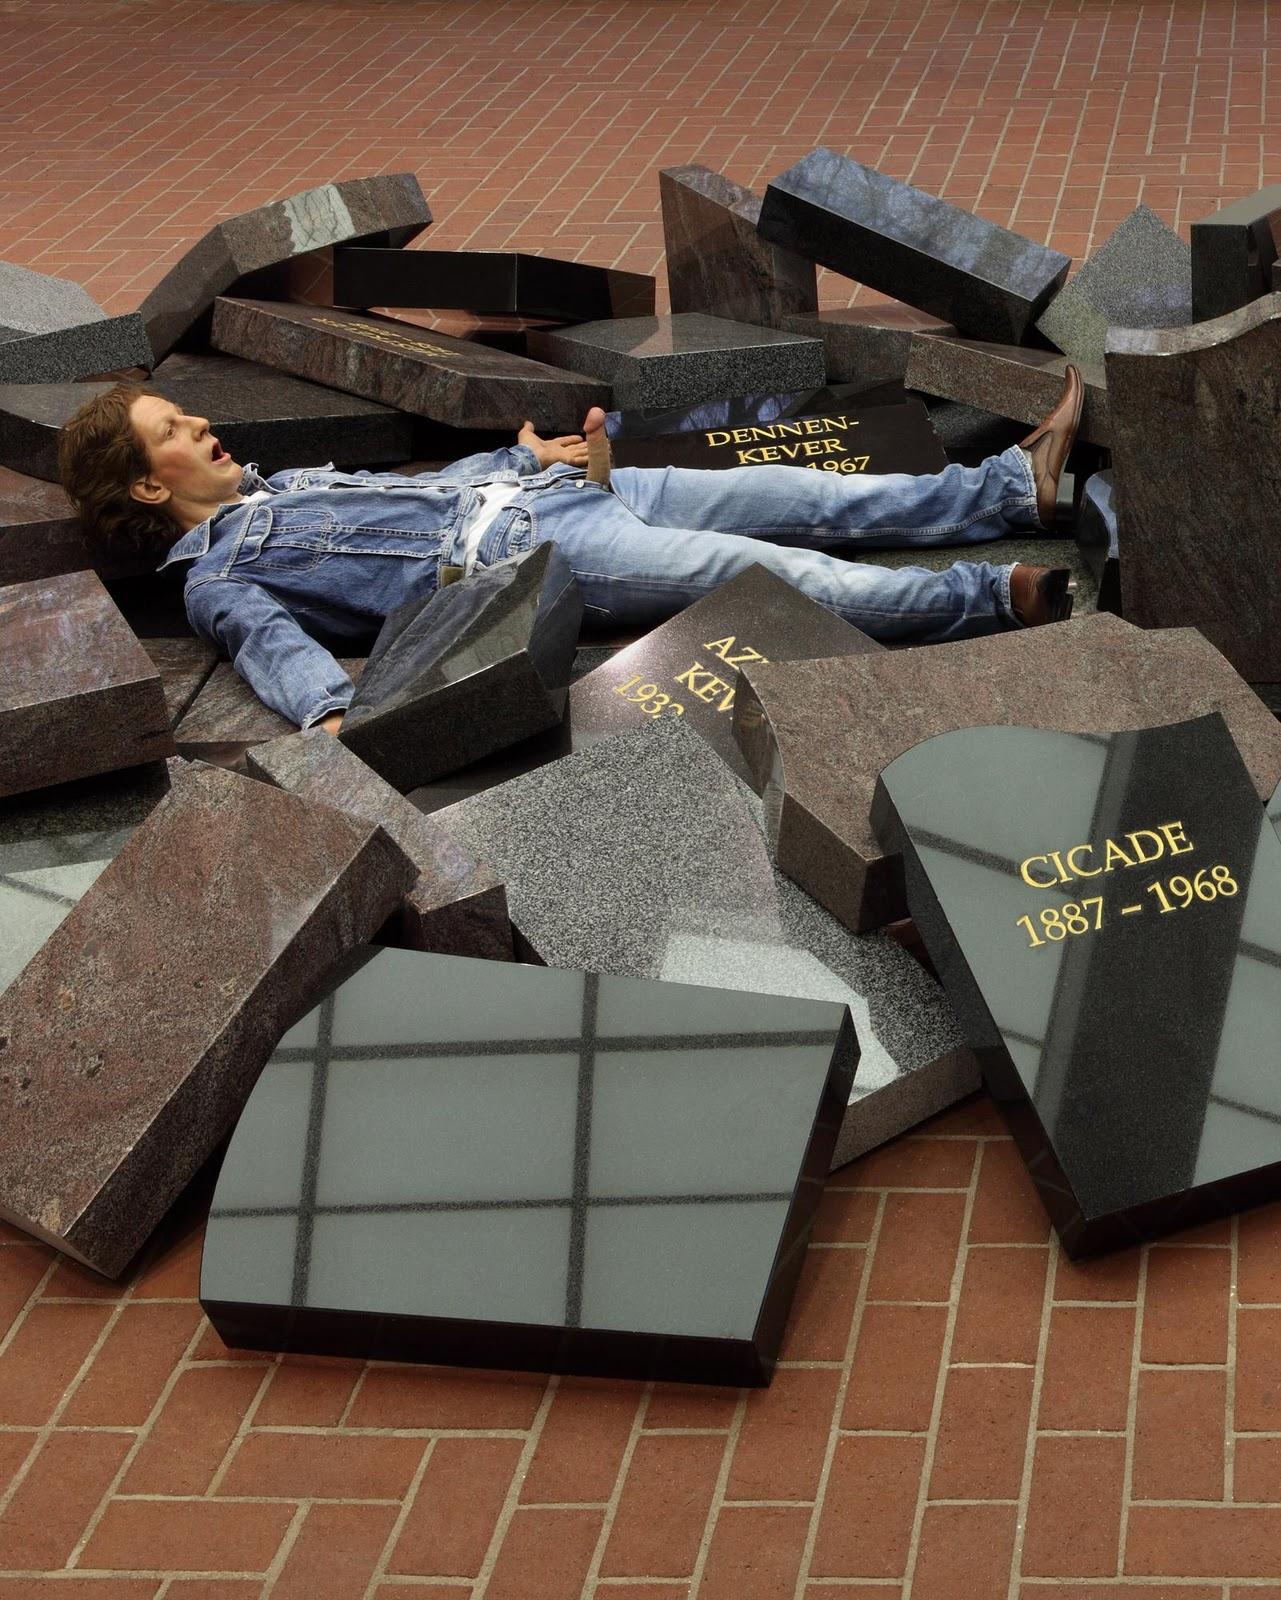 Gesprekken met hedendaagse kunstenaars interview met jan fabre - Hedendaagse fontein ...